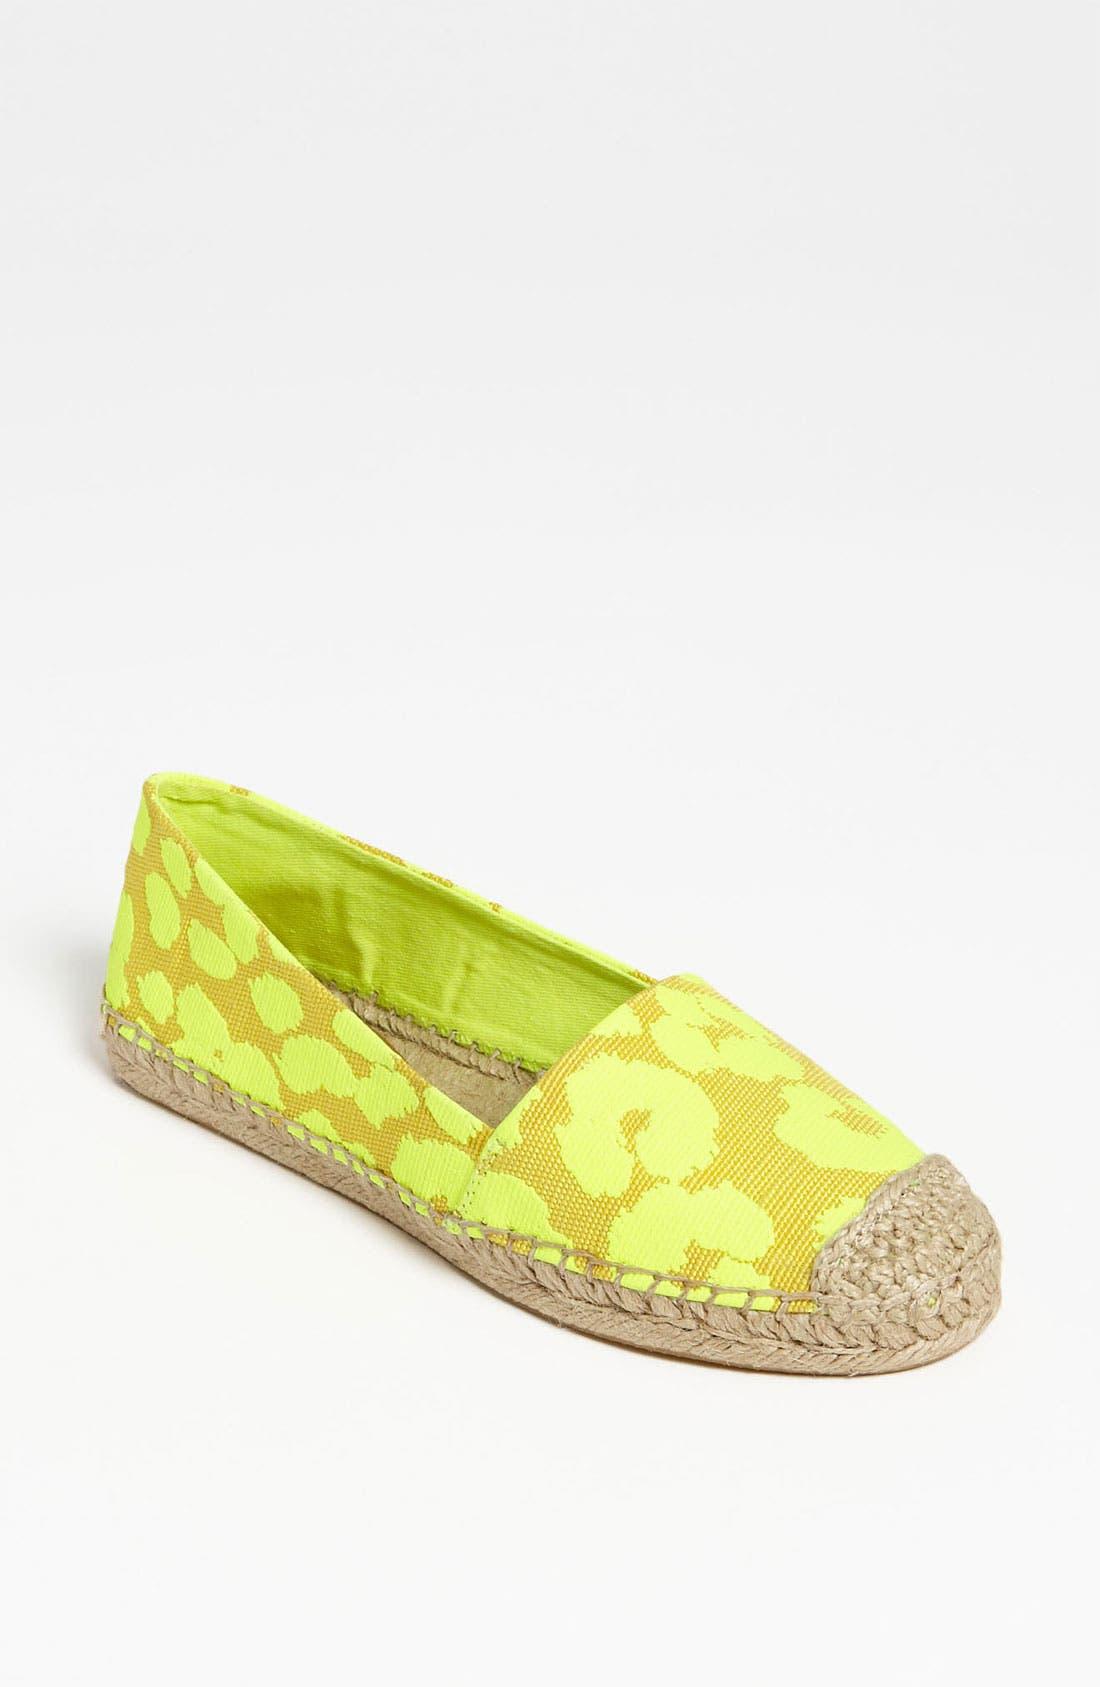 Alternate Image 1 Selected - Juicy Couture 'Gigi' Espadrille Flat